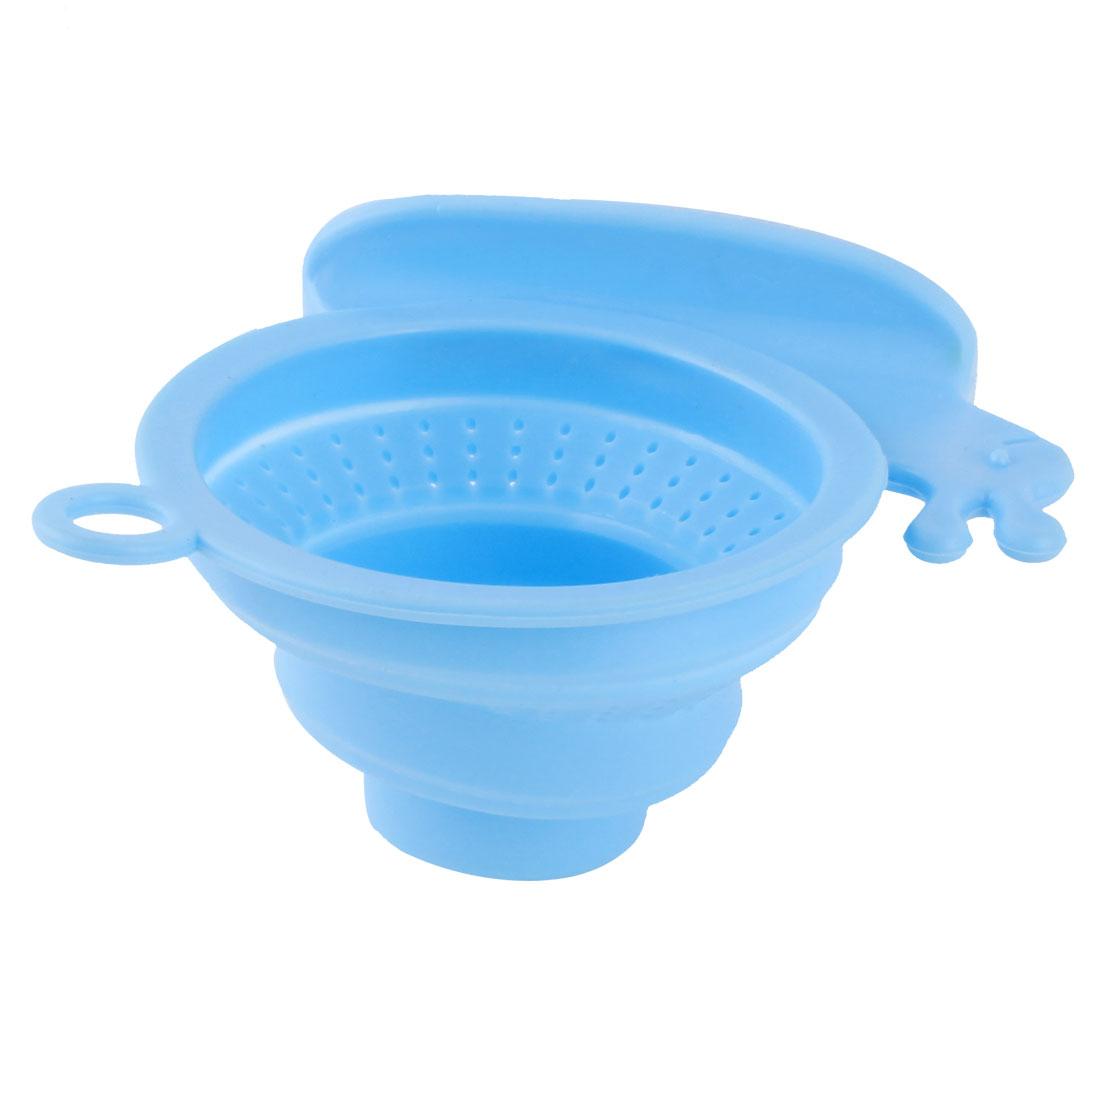 Household Bathroom Silicone Snail Design Basin Sink Floor Drainer Strainer Stopper Filter Blue